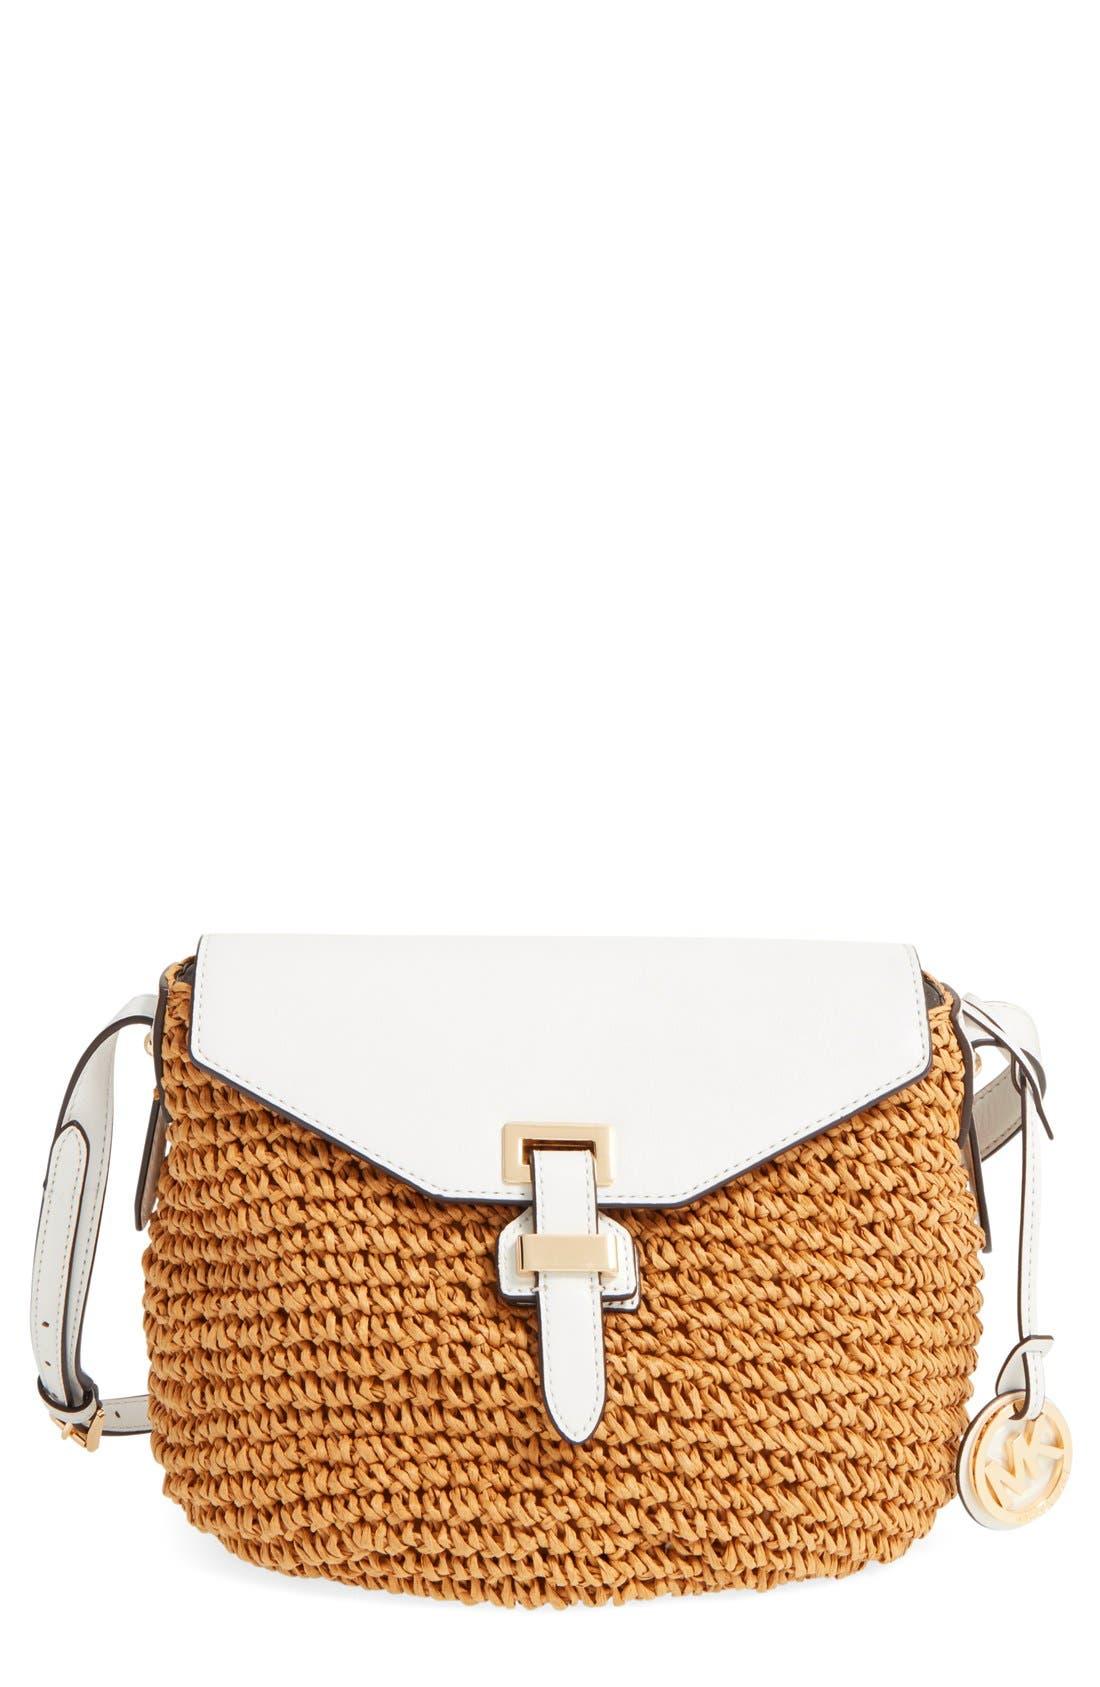 Alternate Image 1 Selected - MICHAEL Michael Kors 'Medium Naomi' Straw & Leather Messenger Bag